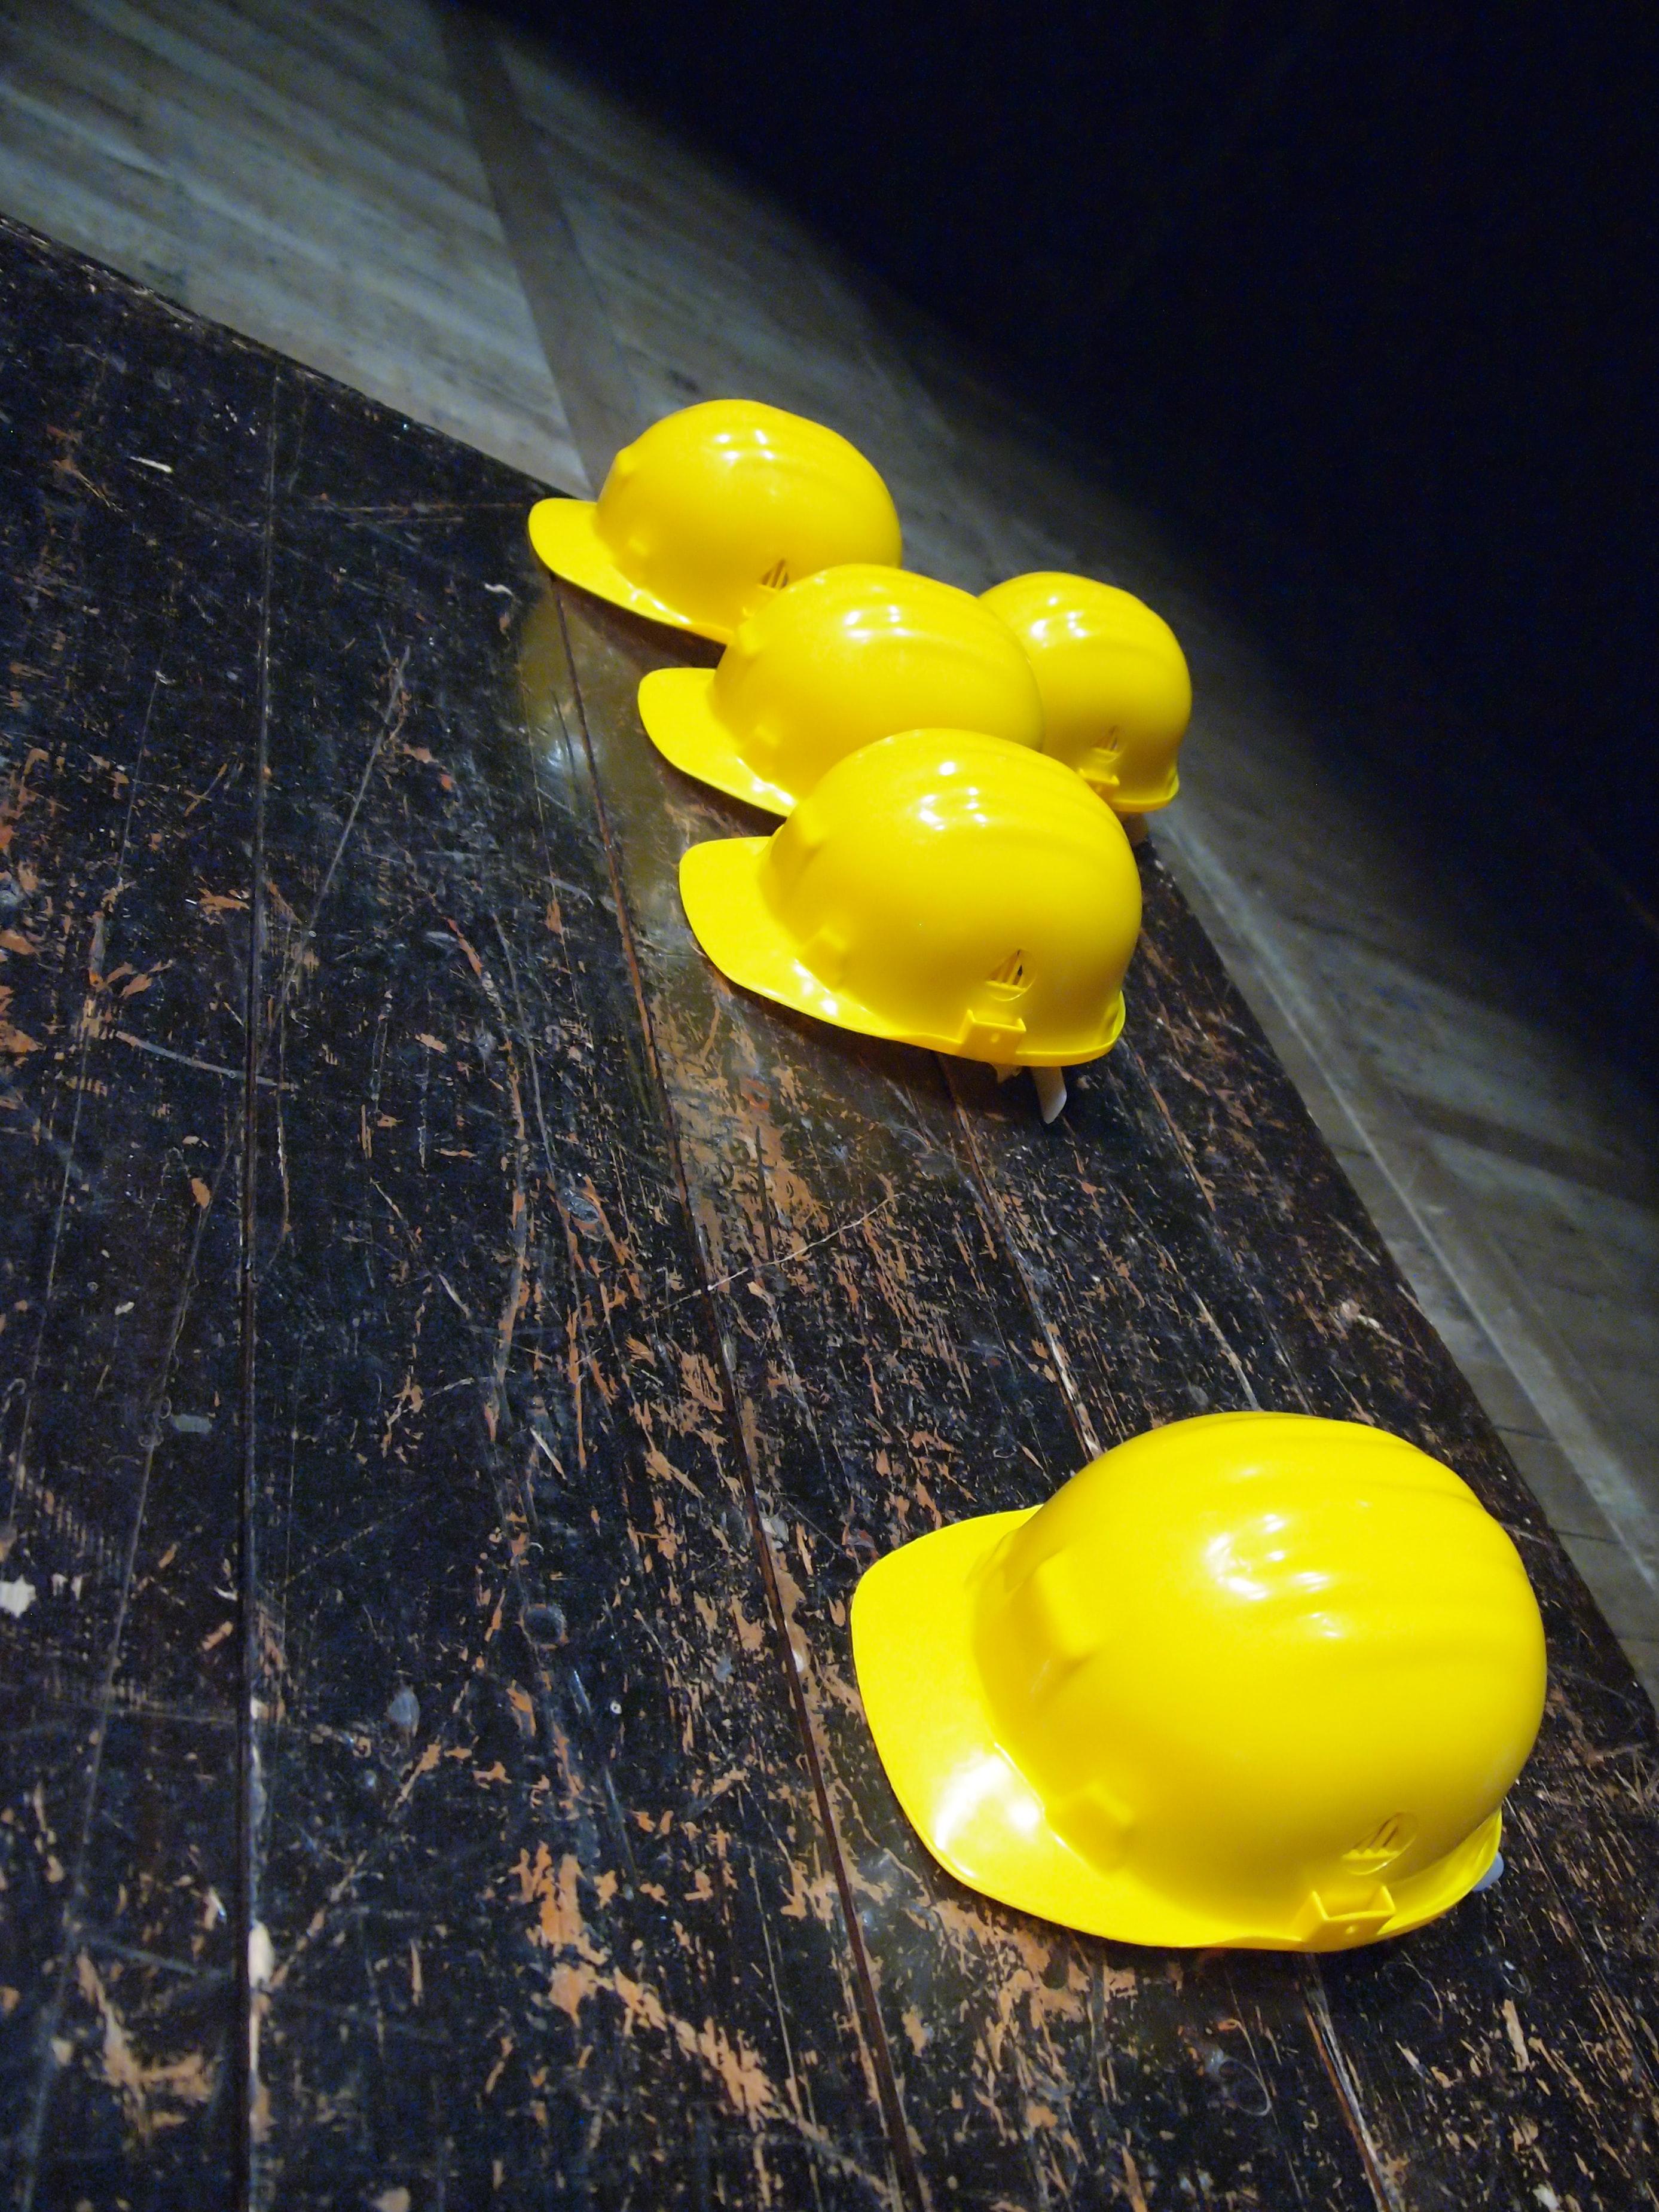 Yellow hard hats